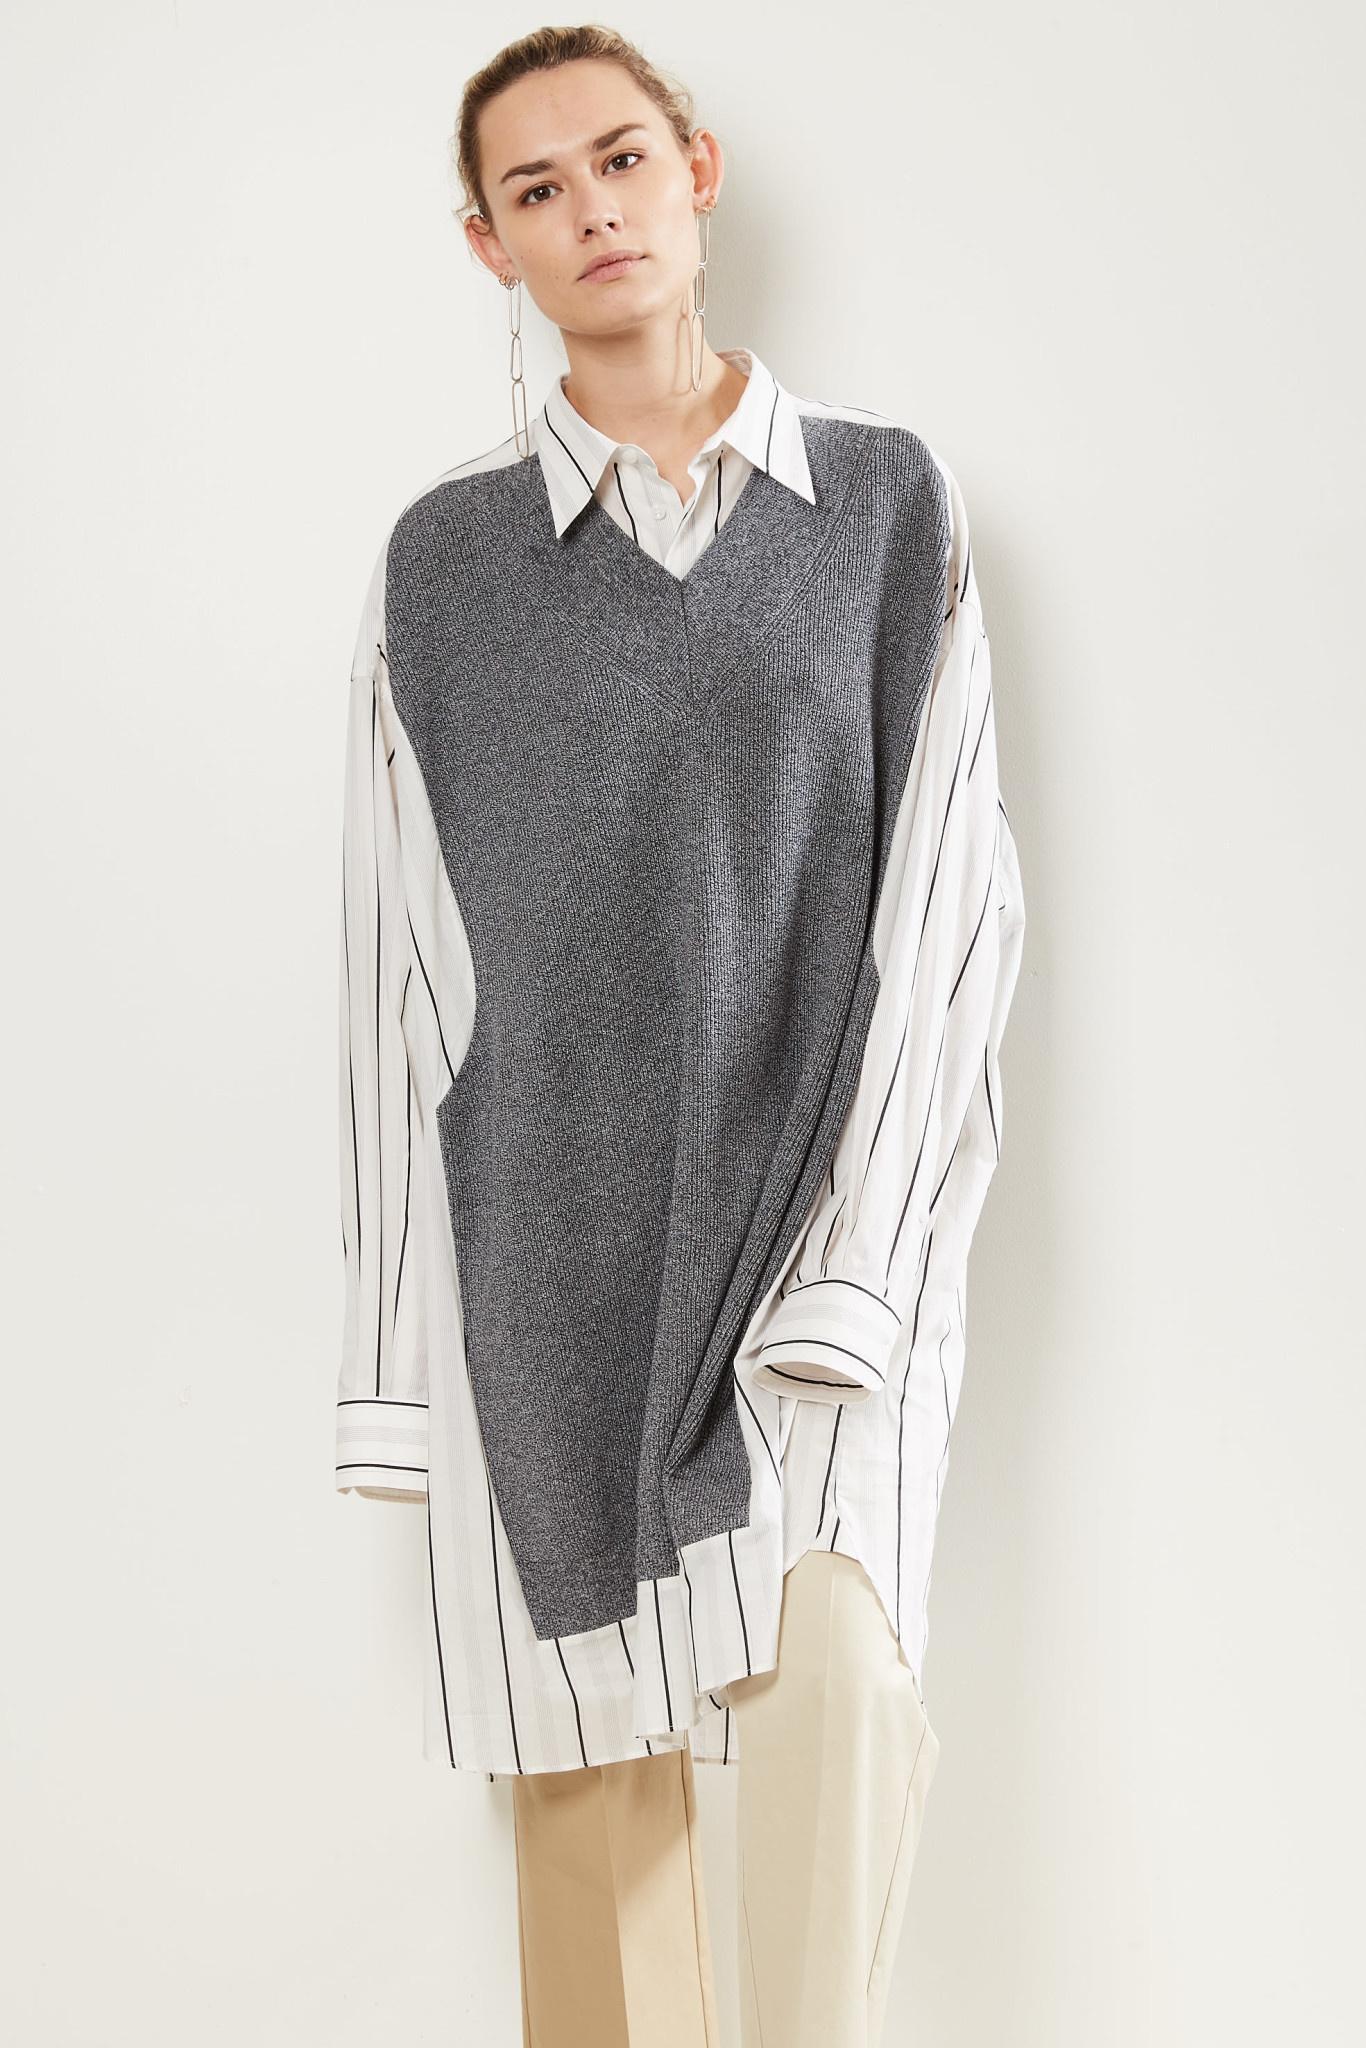 Maison Margiela Knitted tank striped shirt.